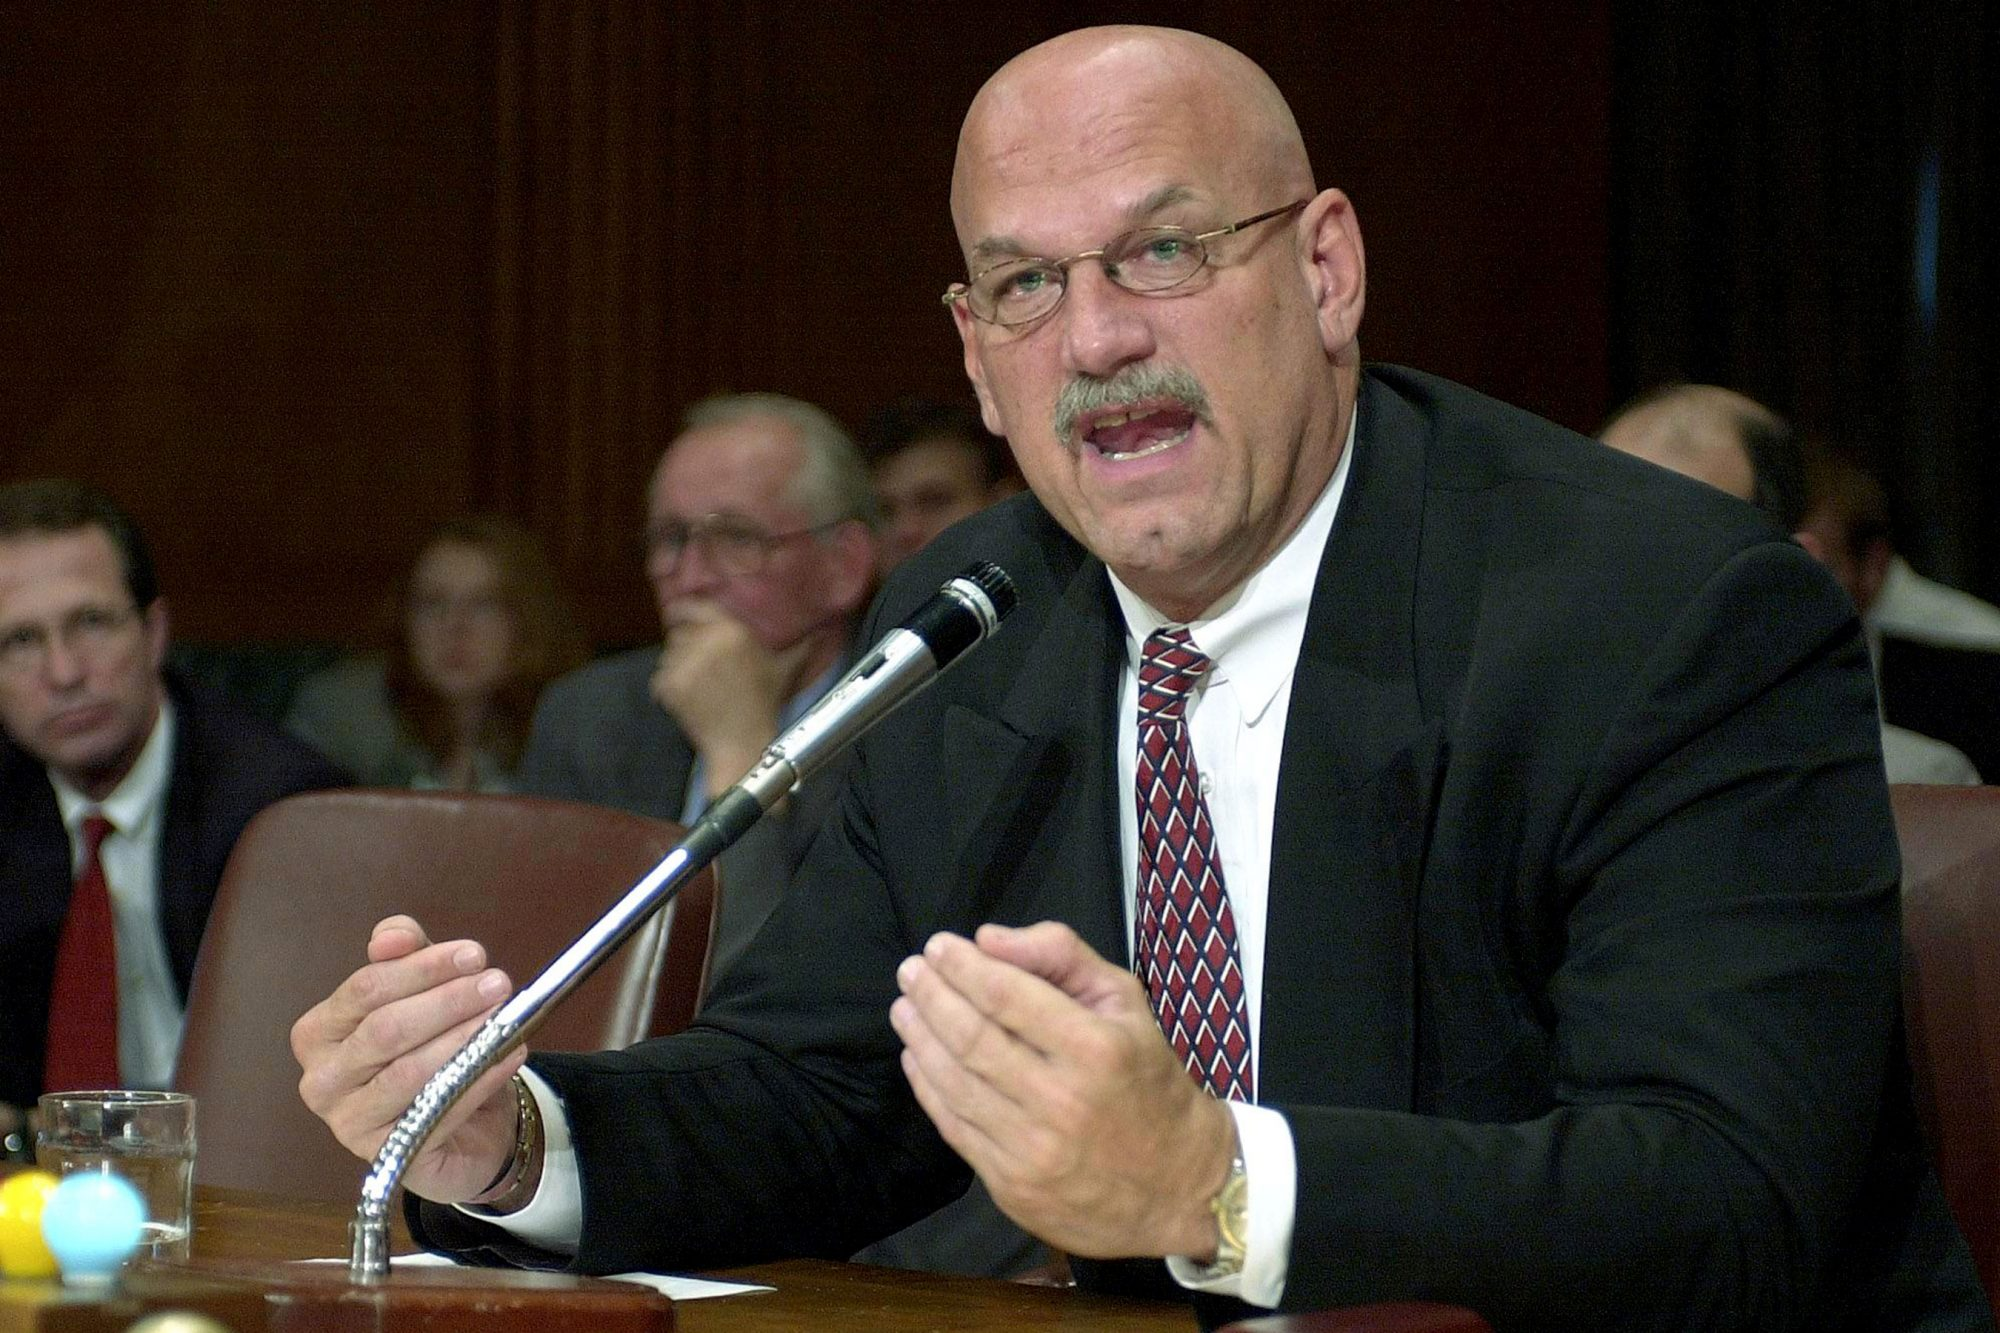 Minnesota Governor Jesse Ventura testifies before